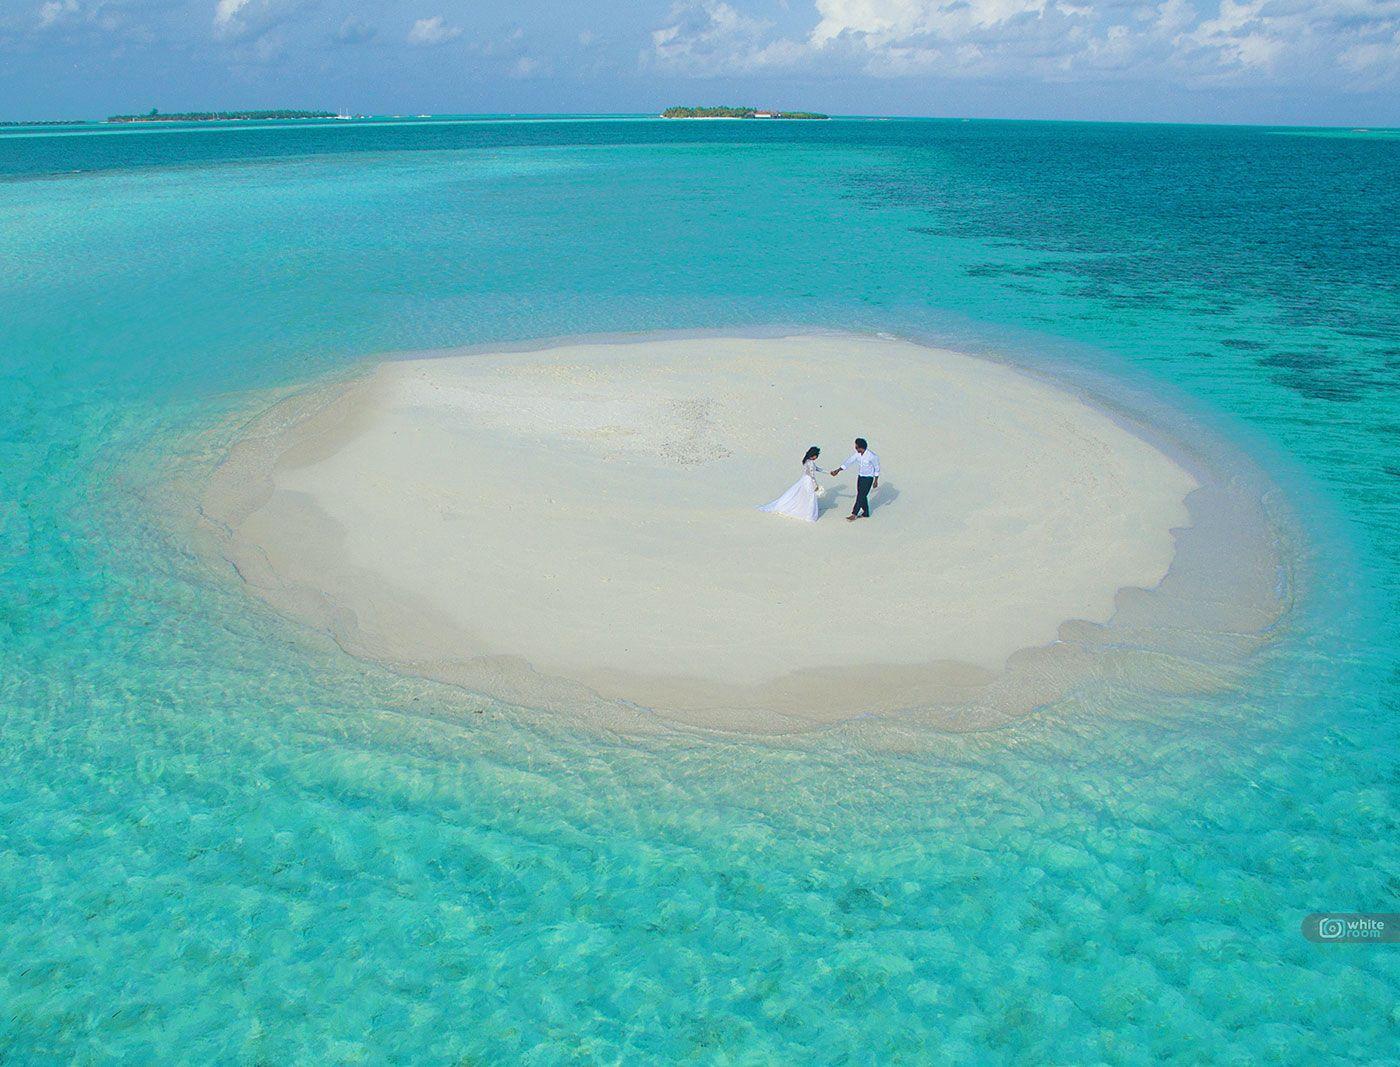 SANDBANK TRIPS Maldives is the best barefoot luxury